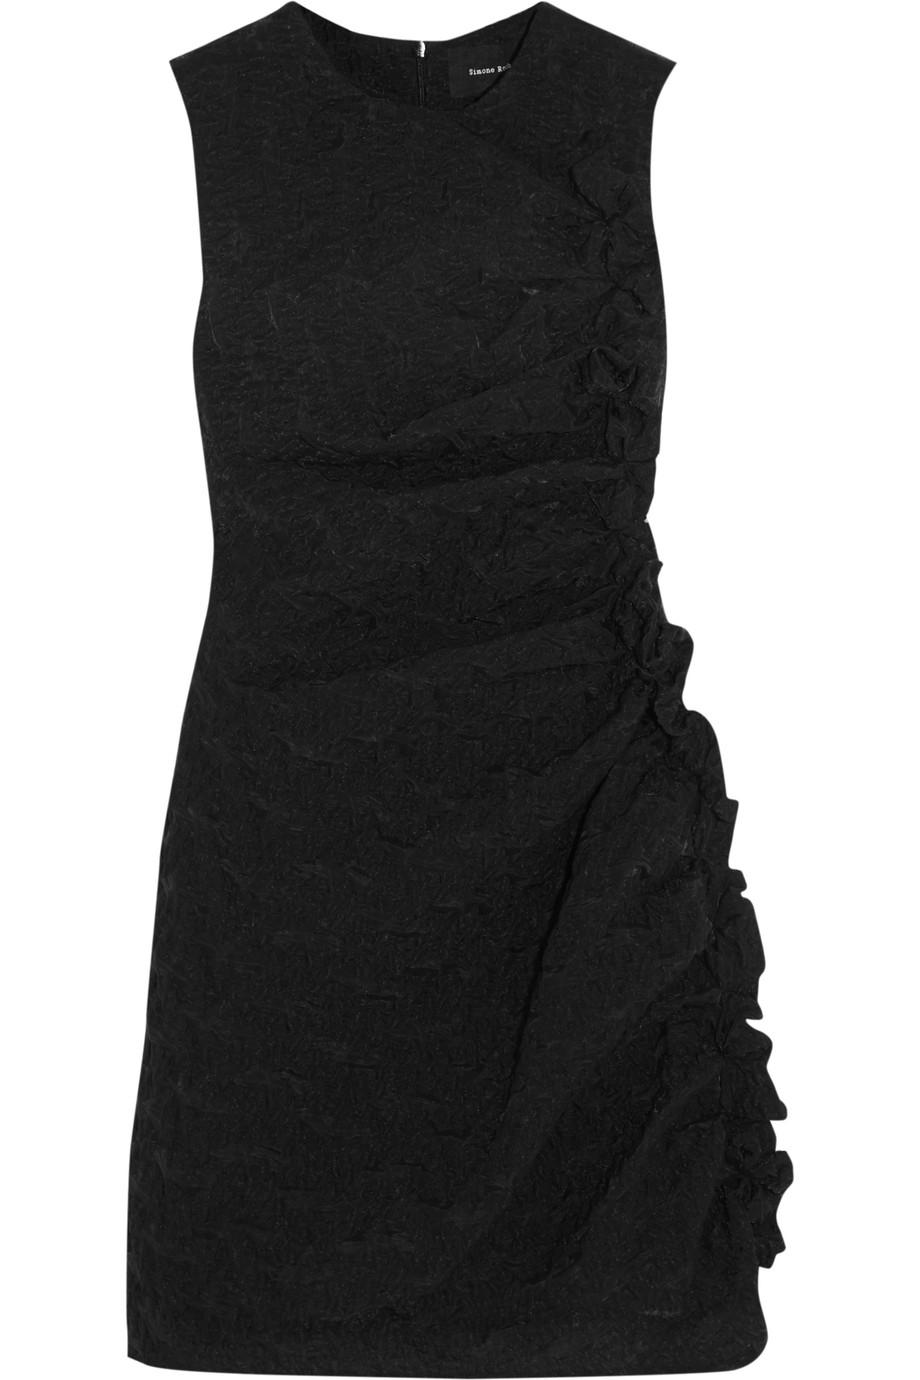 Simone Rocha Ruffled Cloqué Mini Dress, Black, Women's, Size: 6